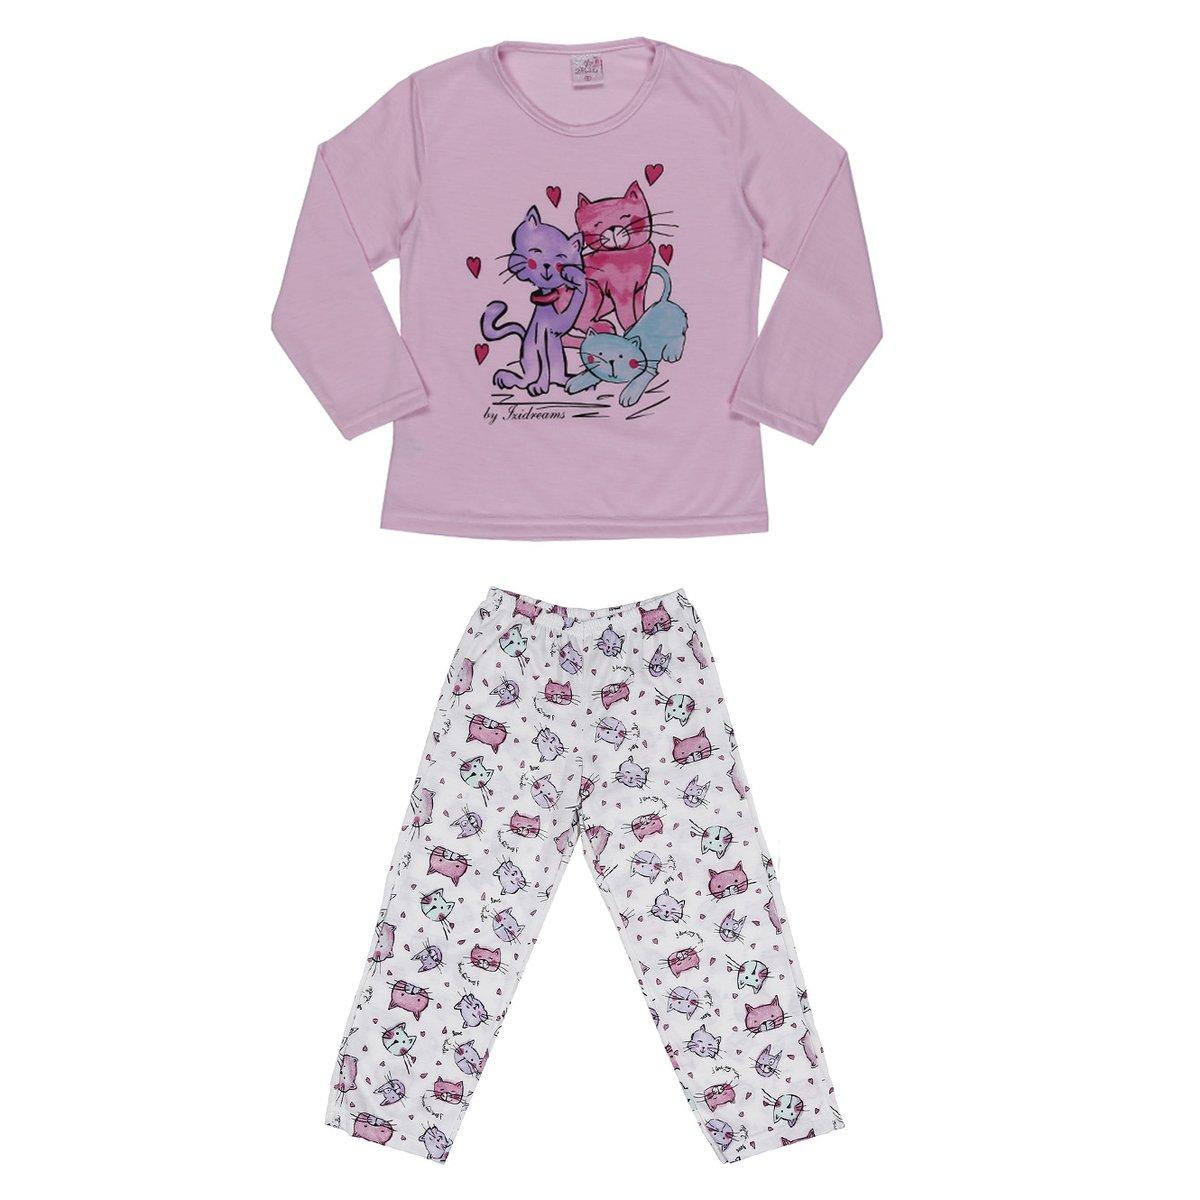 bf07b649630316 Pijama Longo Izi Dreams - Rosa